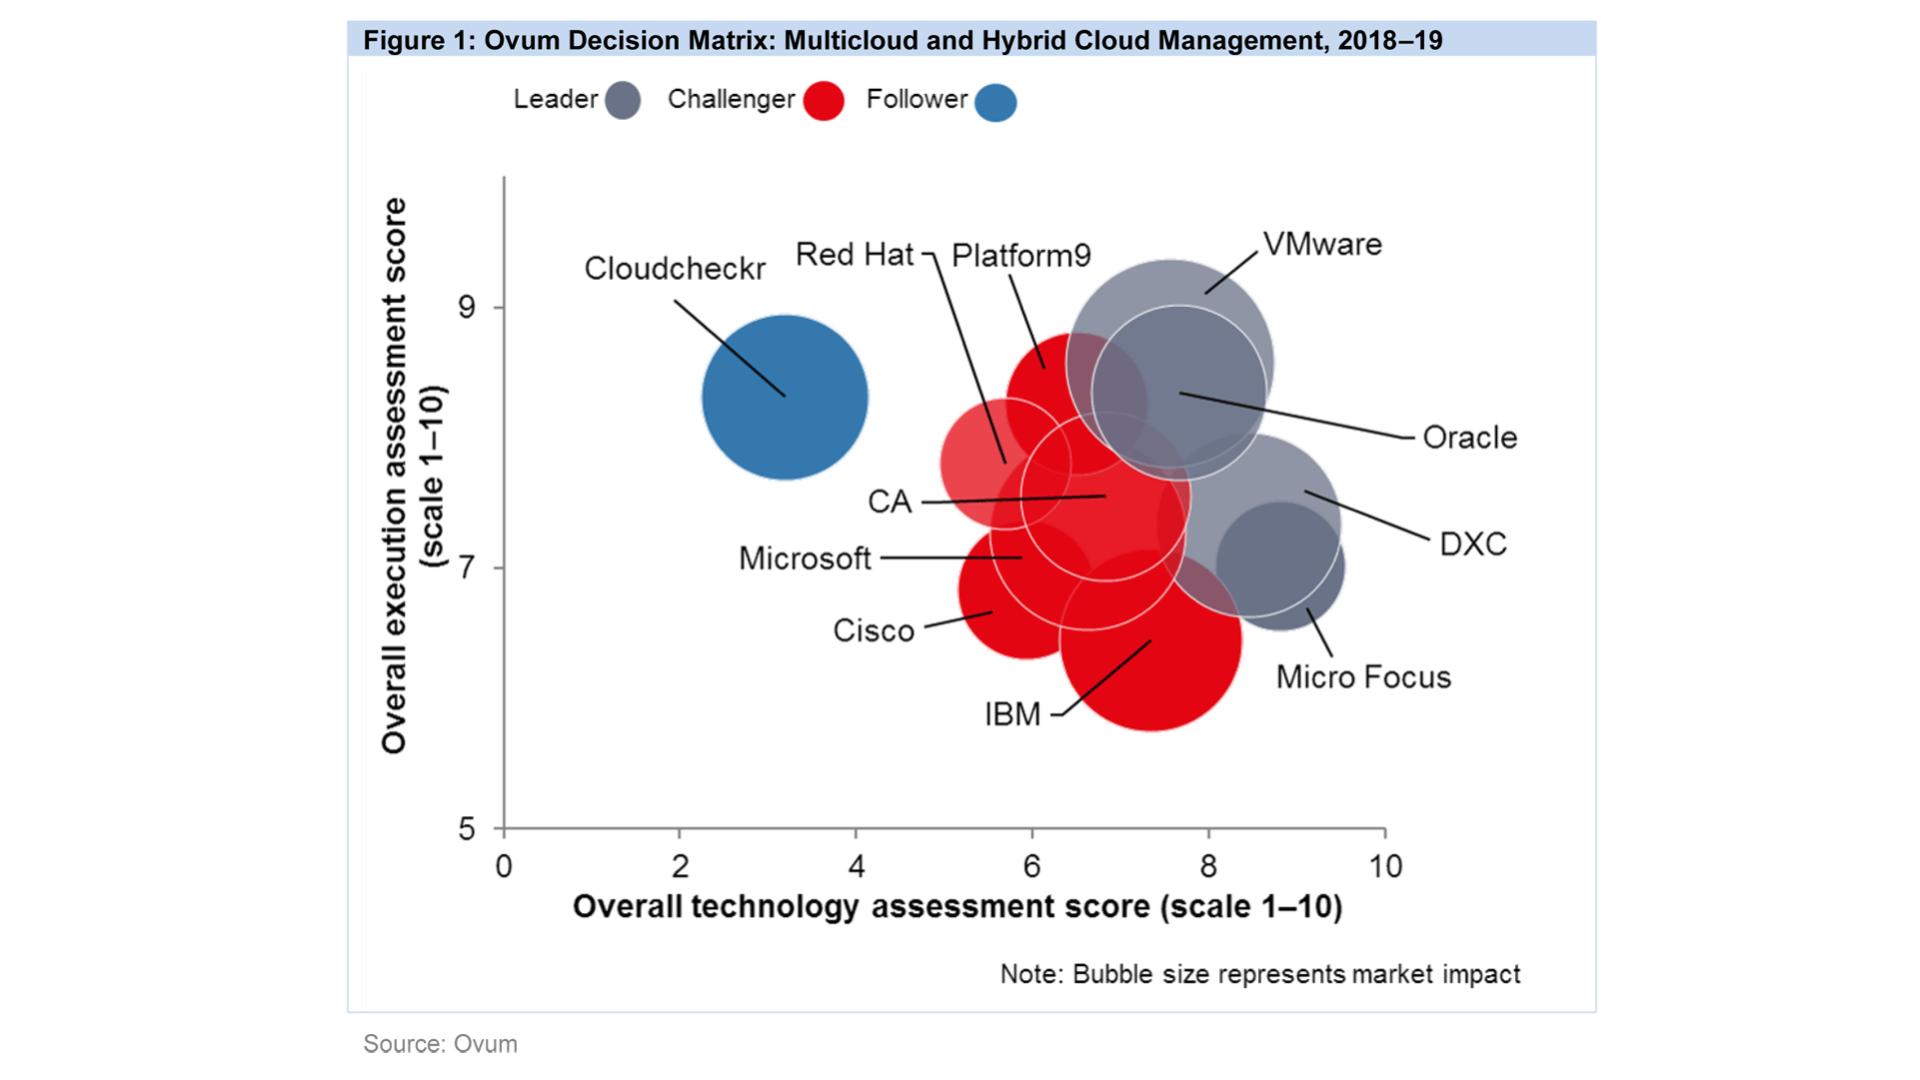 Ovum Decision Matrix: Multicloud and Hybrid Cloud Management